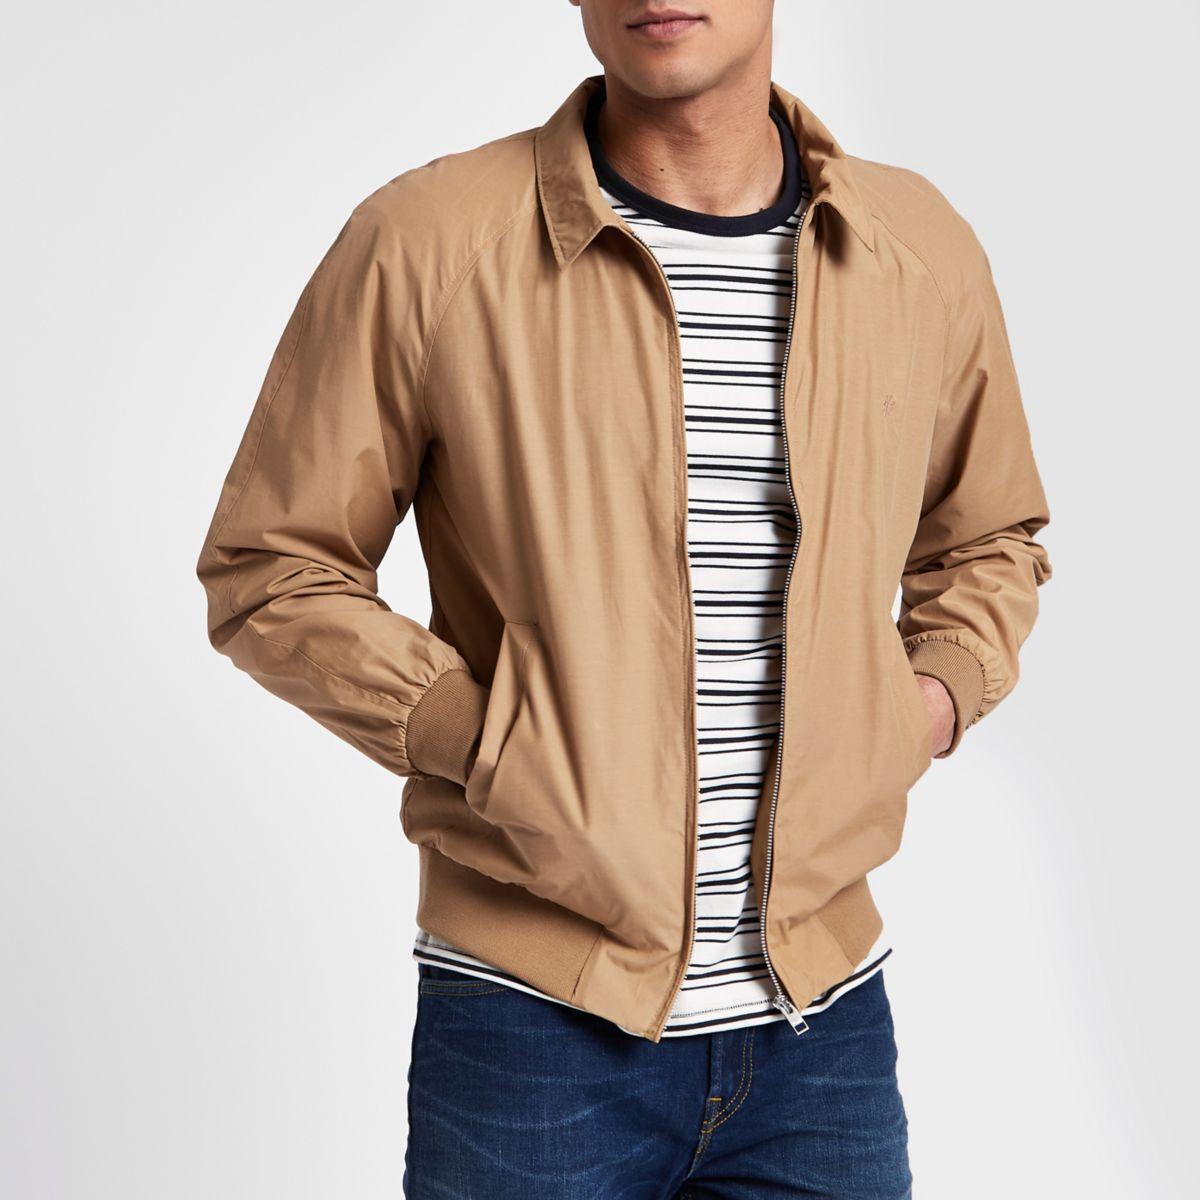 Jack & Jones tan harrington jacket